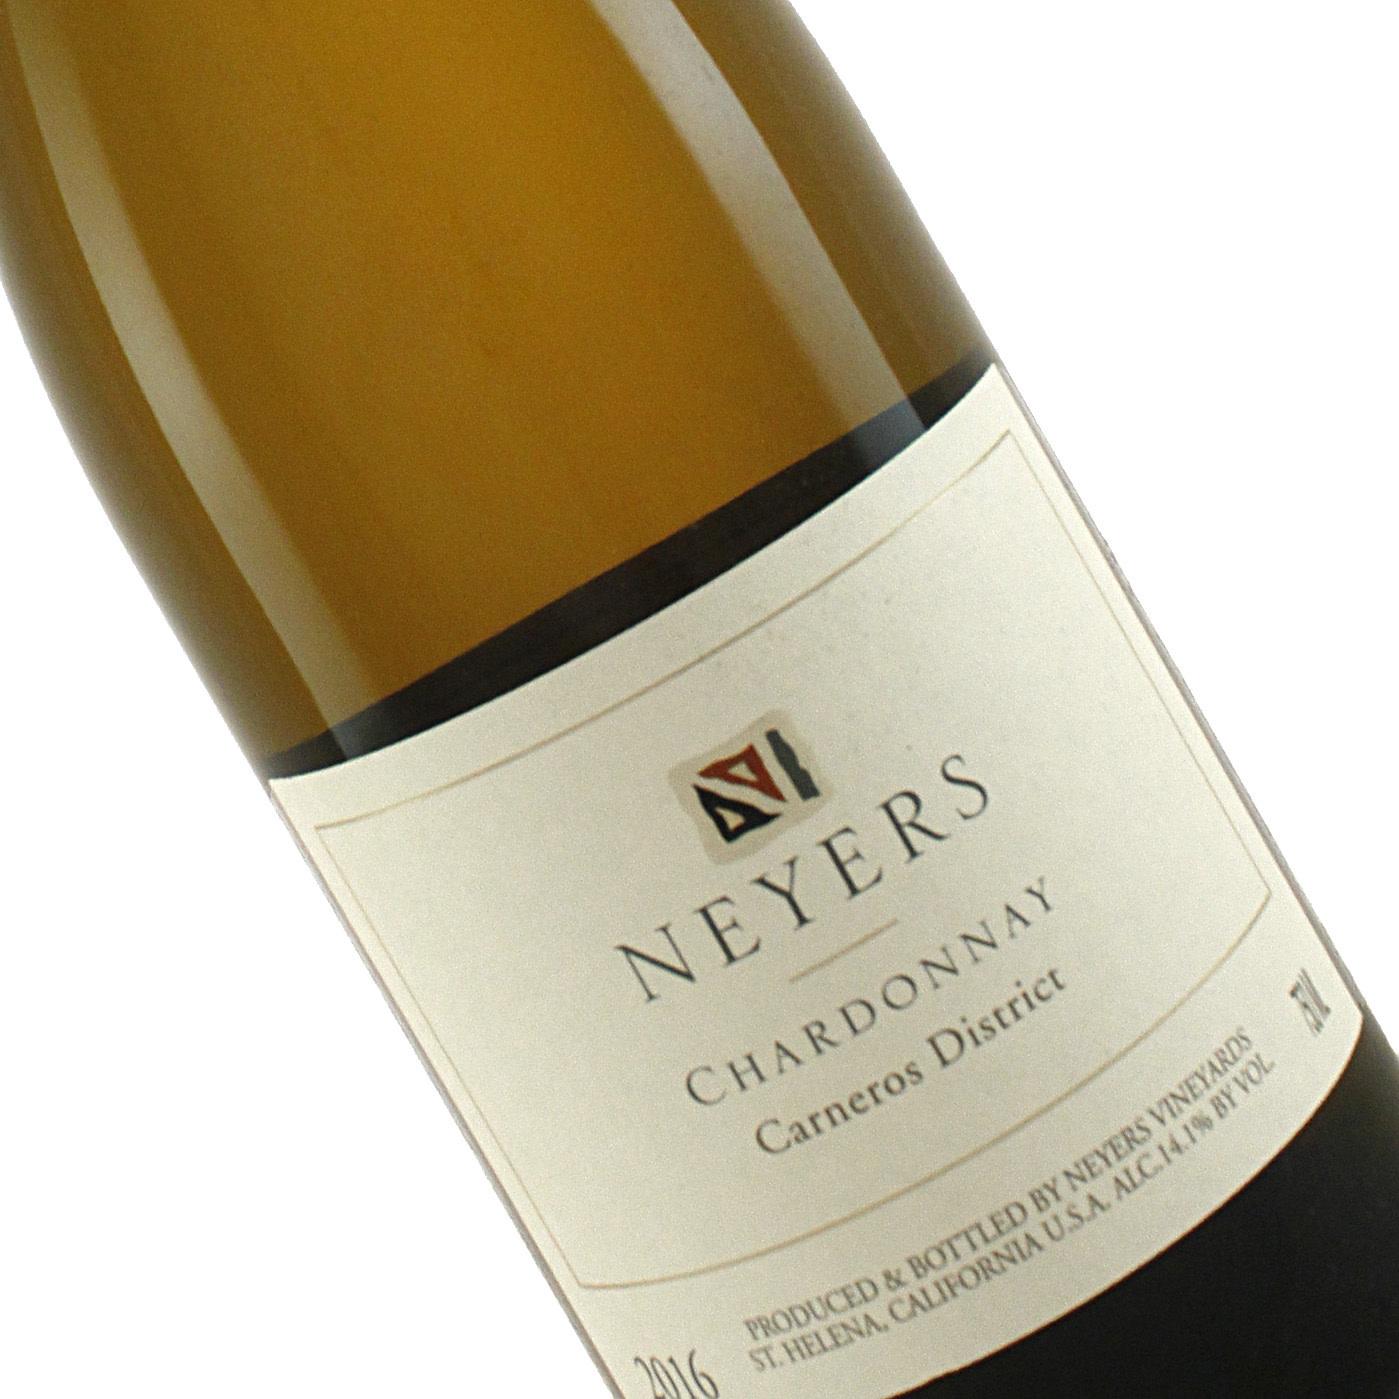 Neyers 2016 Chardonnay, Carneros